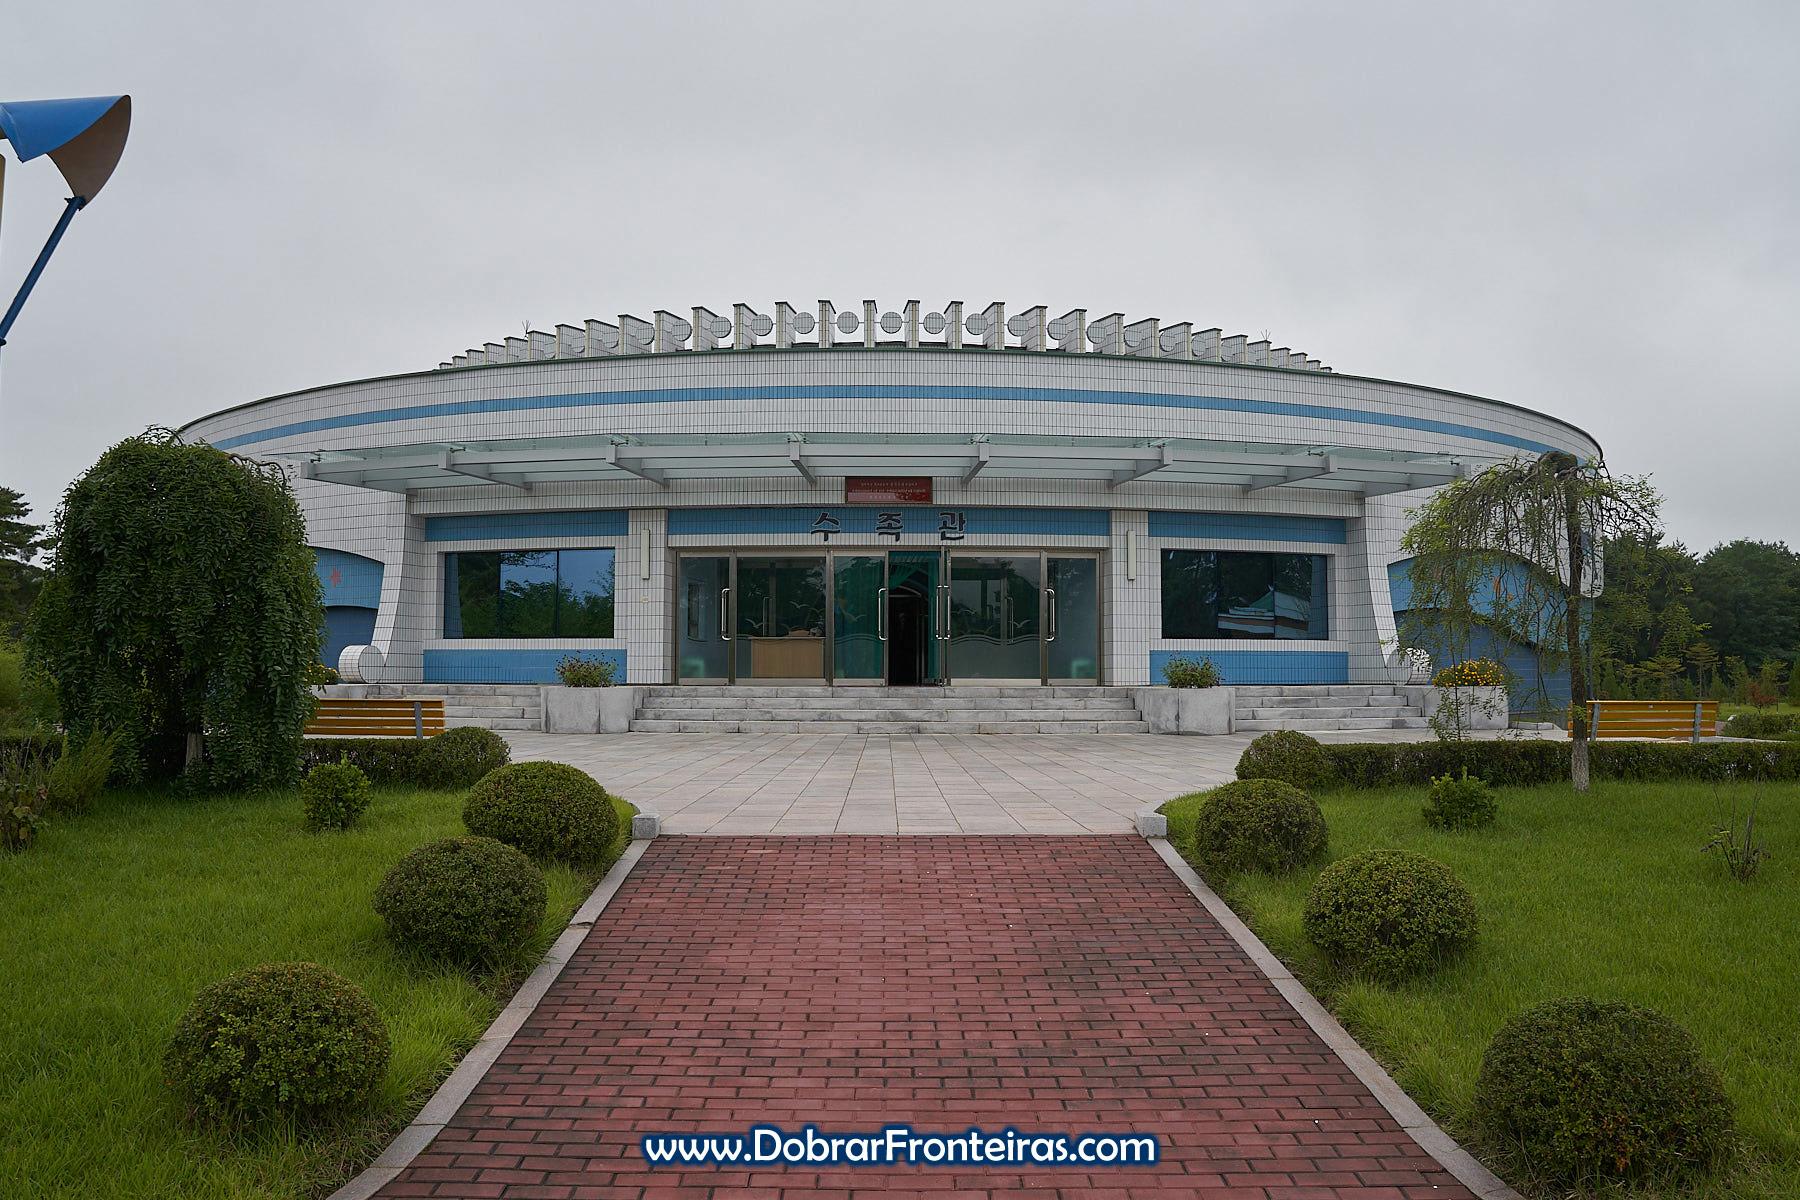 edificío do aquário